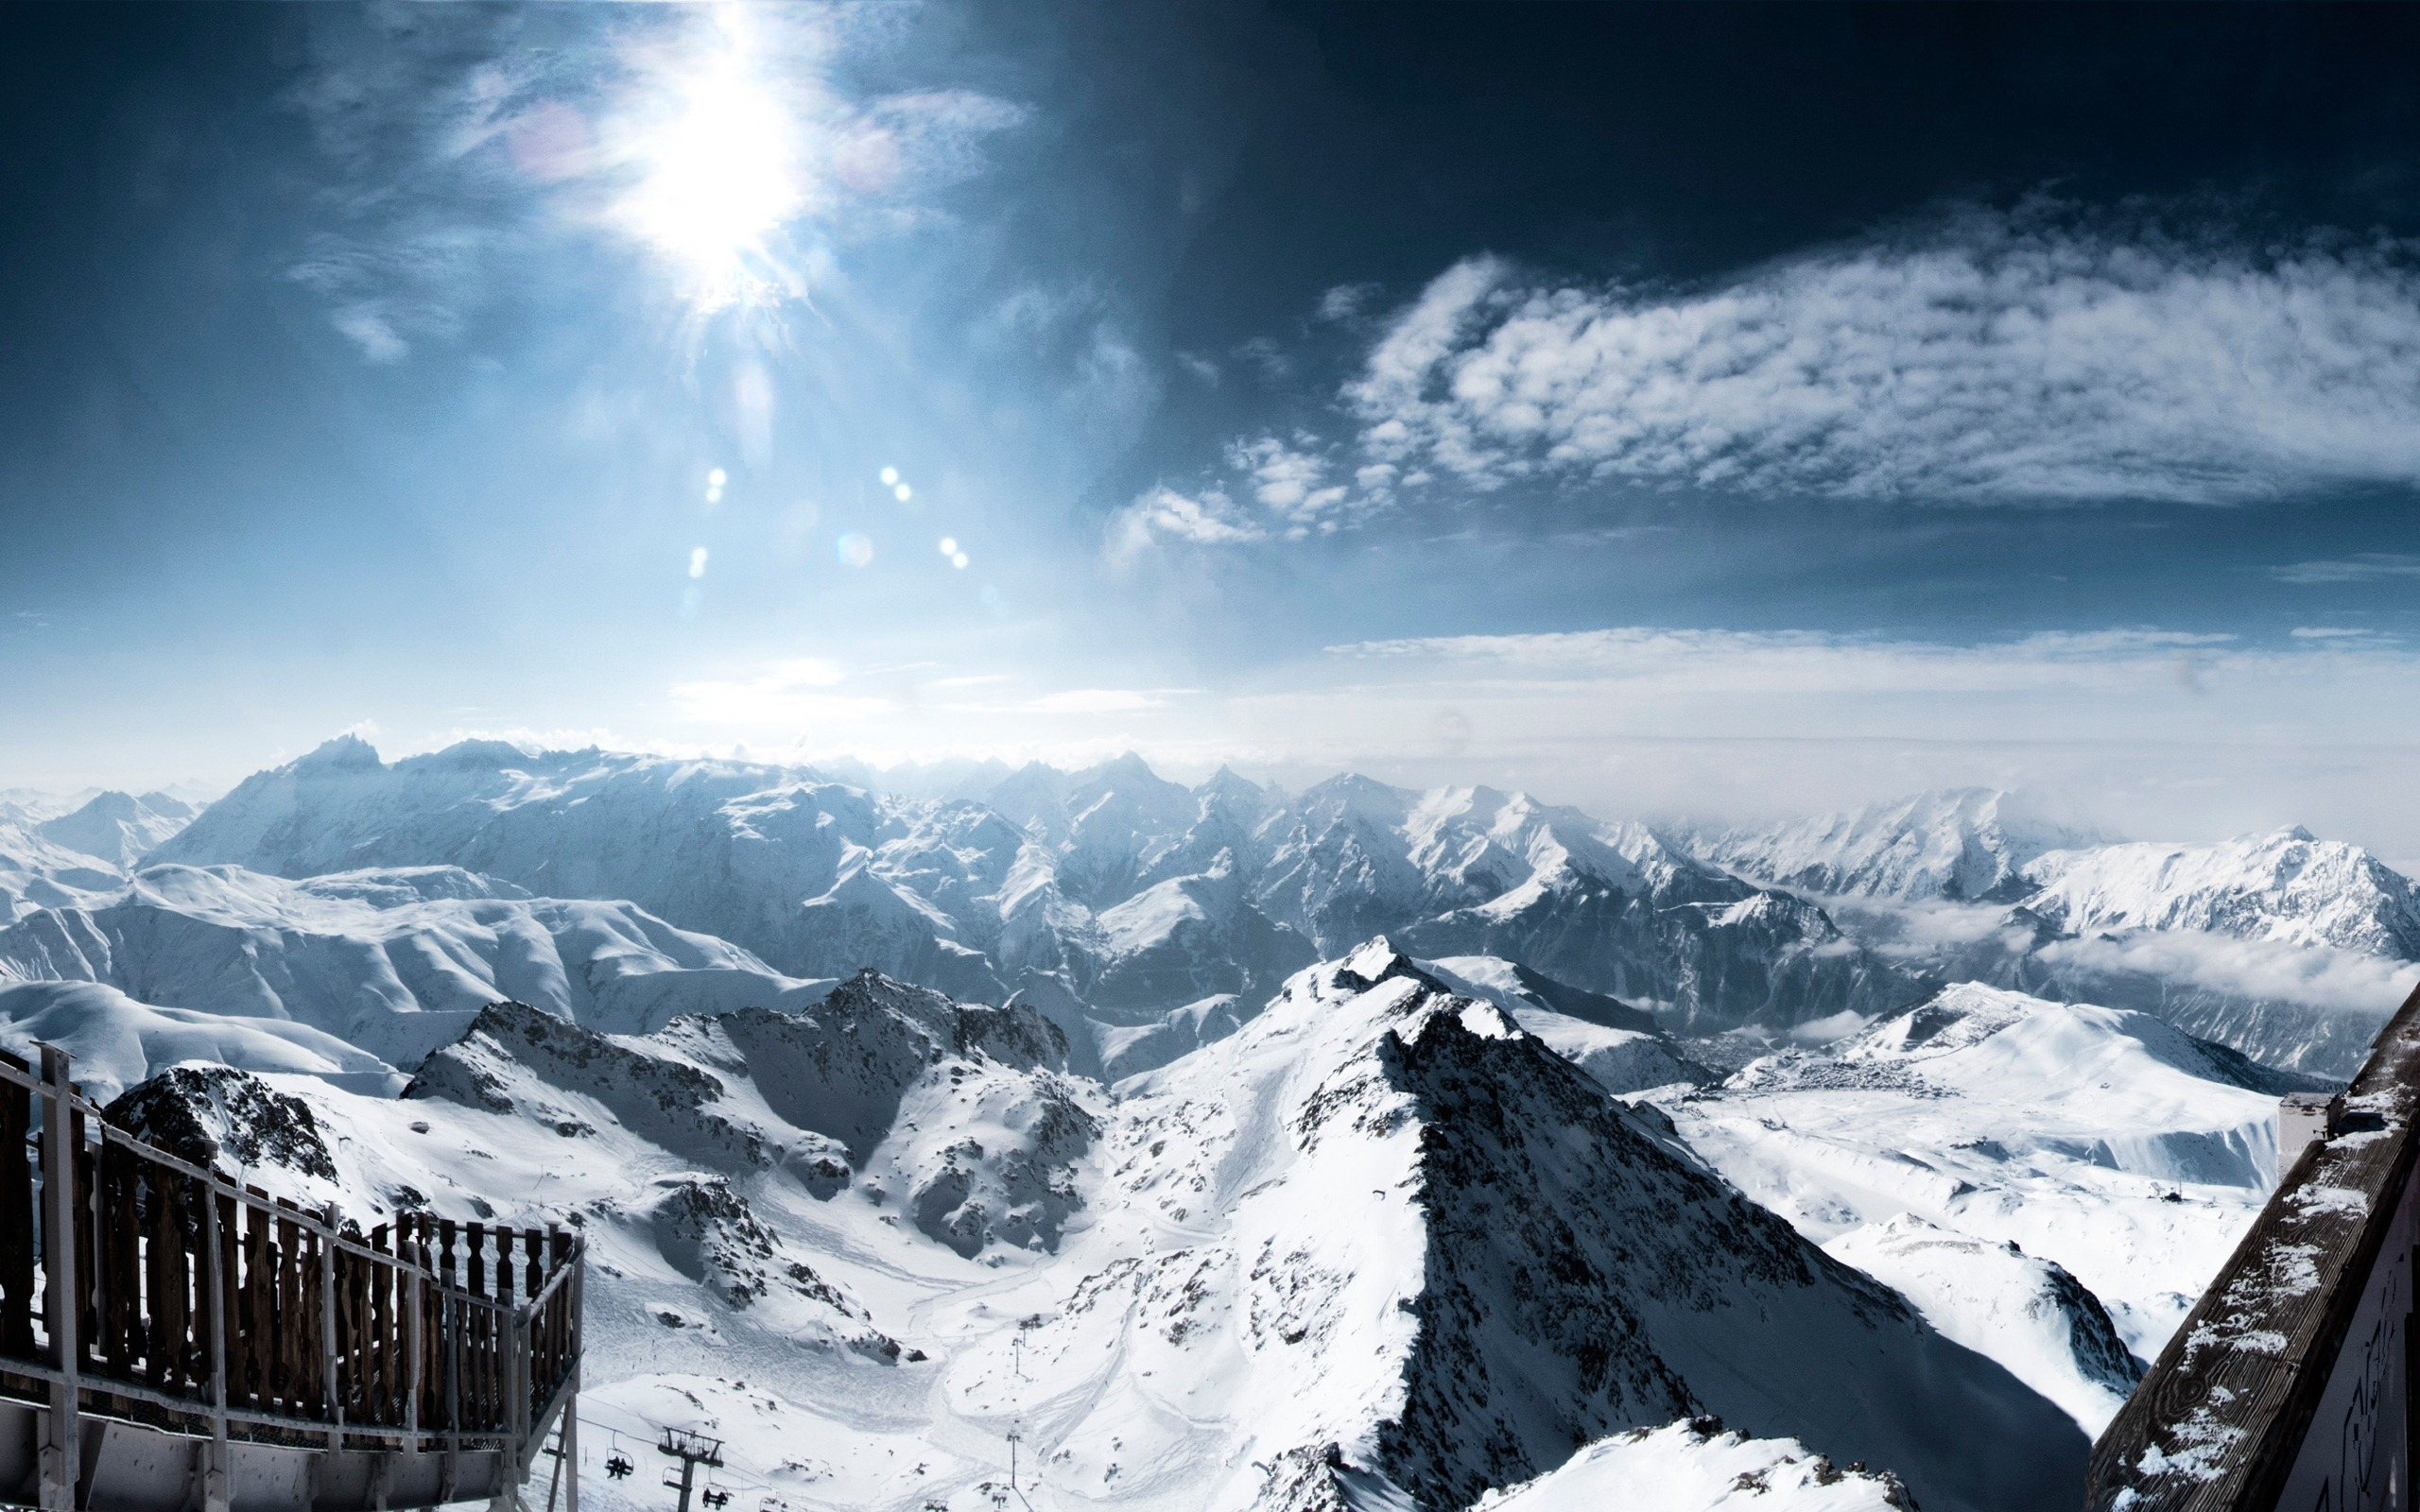 snowy mountains background download free. - media file | pixelstalk